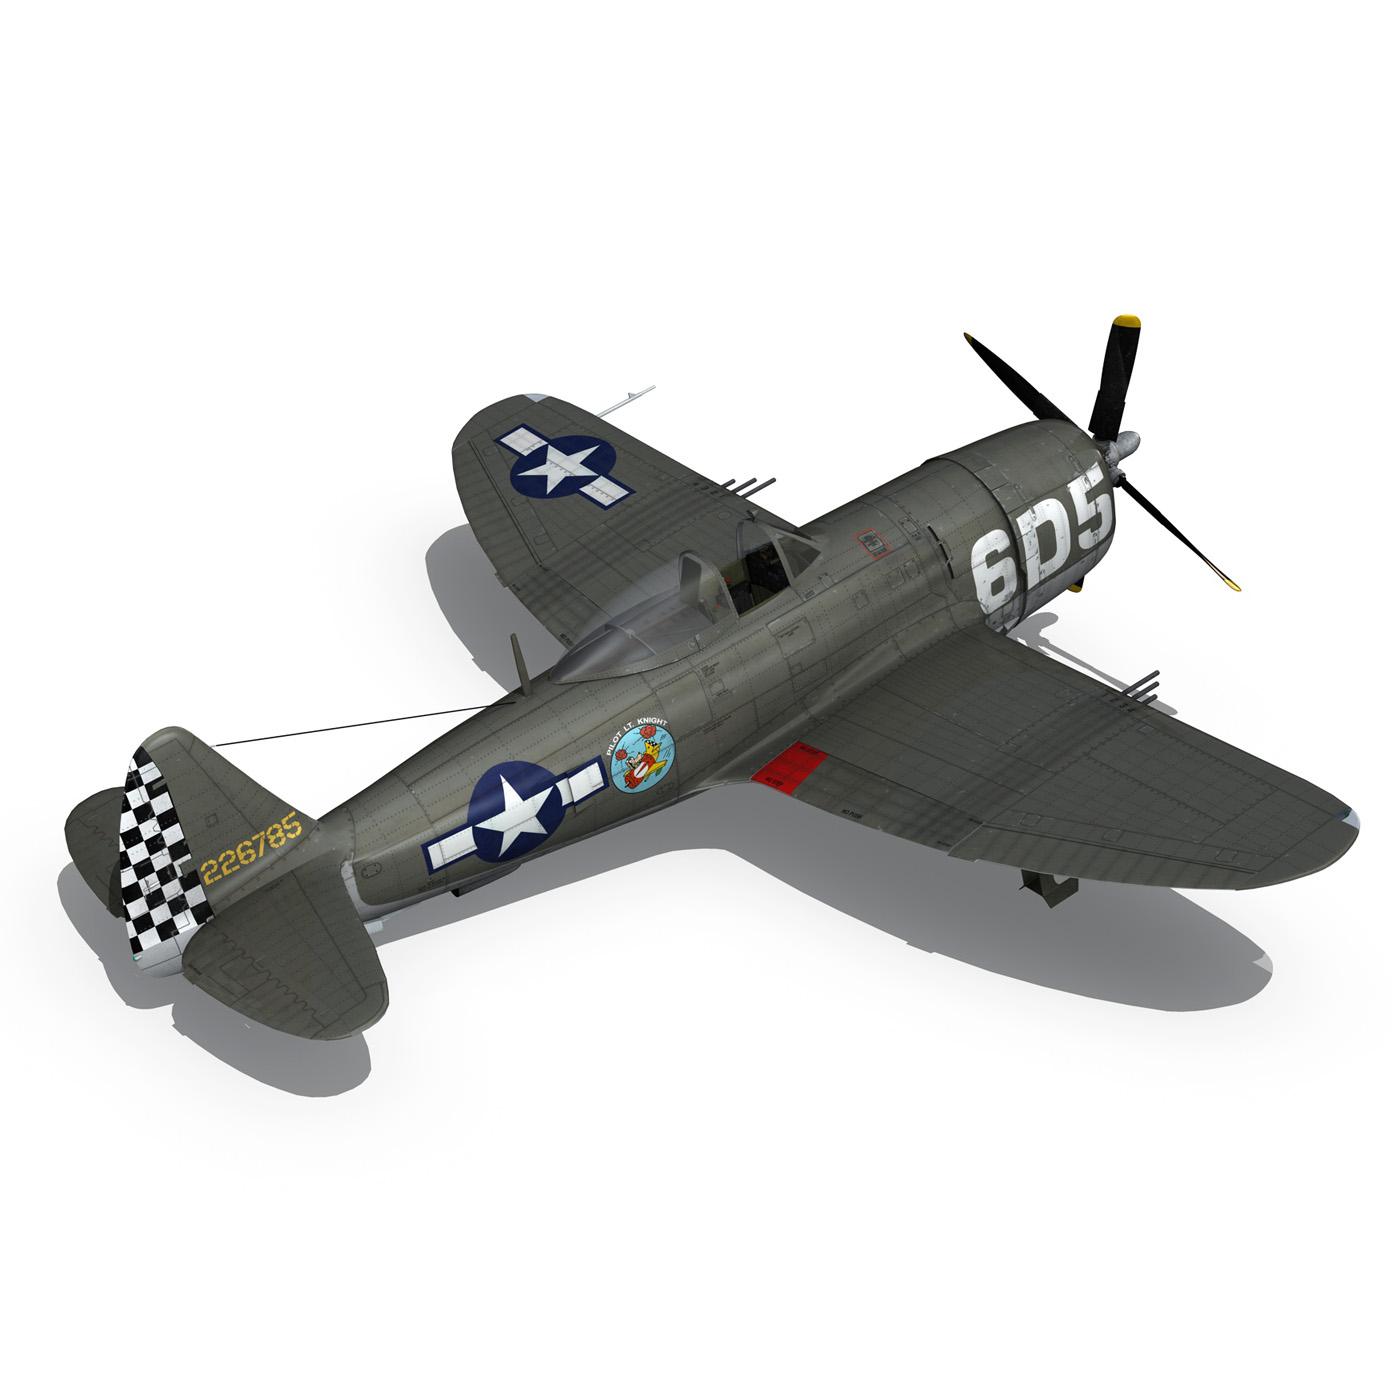 republic p-47 thunderbolt – oh johnnie 3d model fbx c4d lwo obj 274258